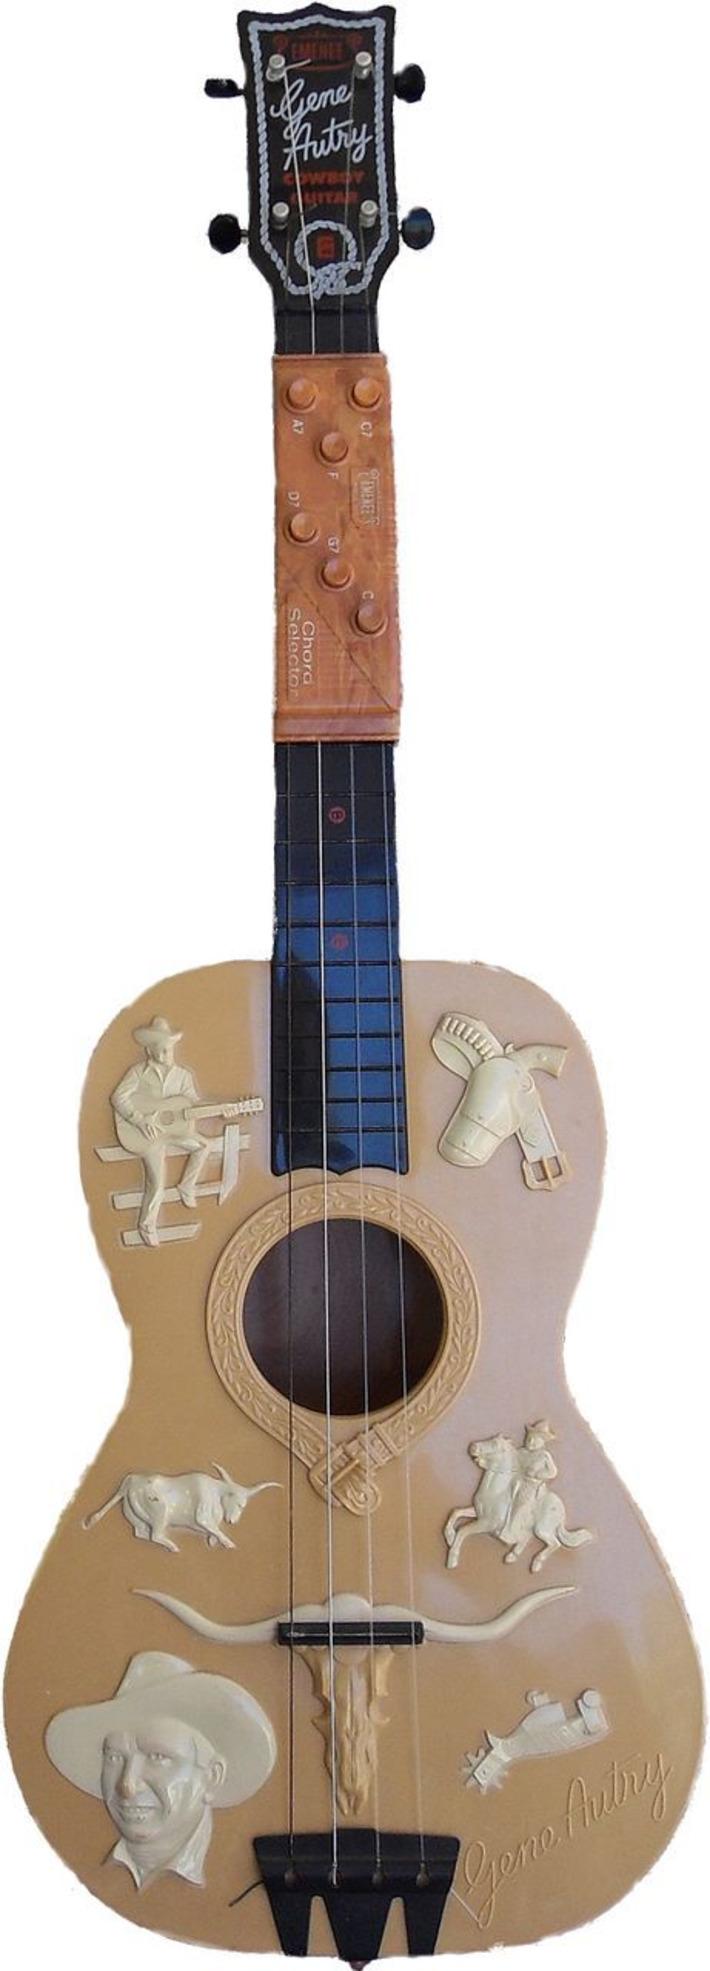 1955 Emenee Gene Autry Cowboy Guitar w/Chord Player | Antiques & Vintage Collectibles | Scoop.it